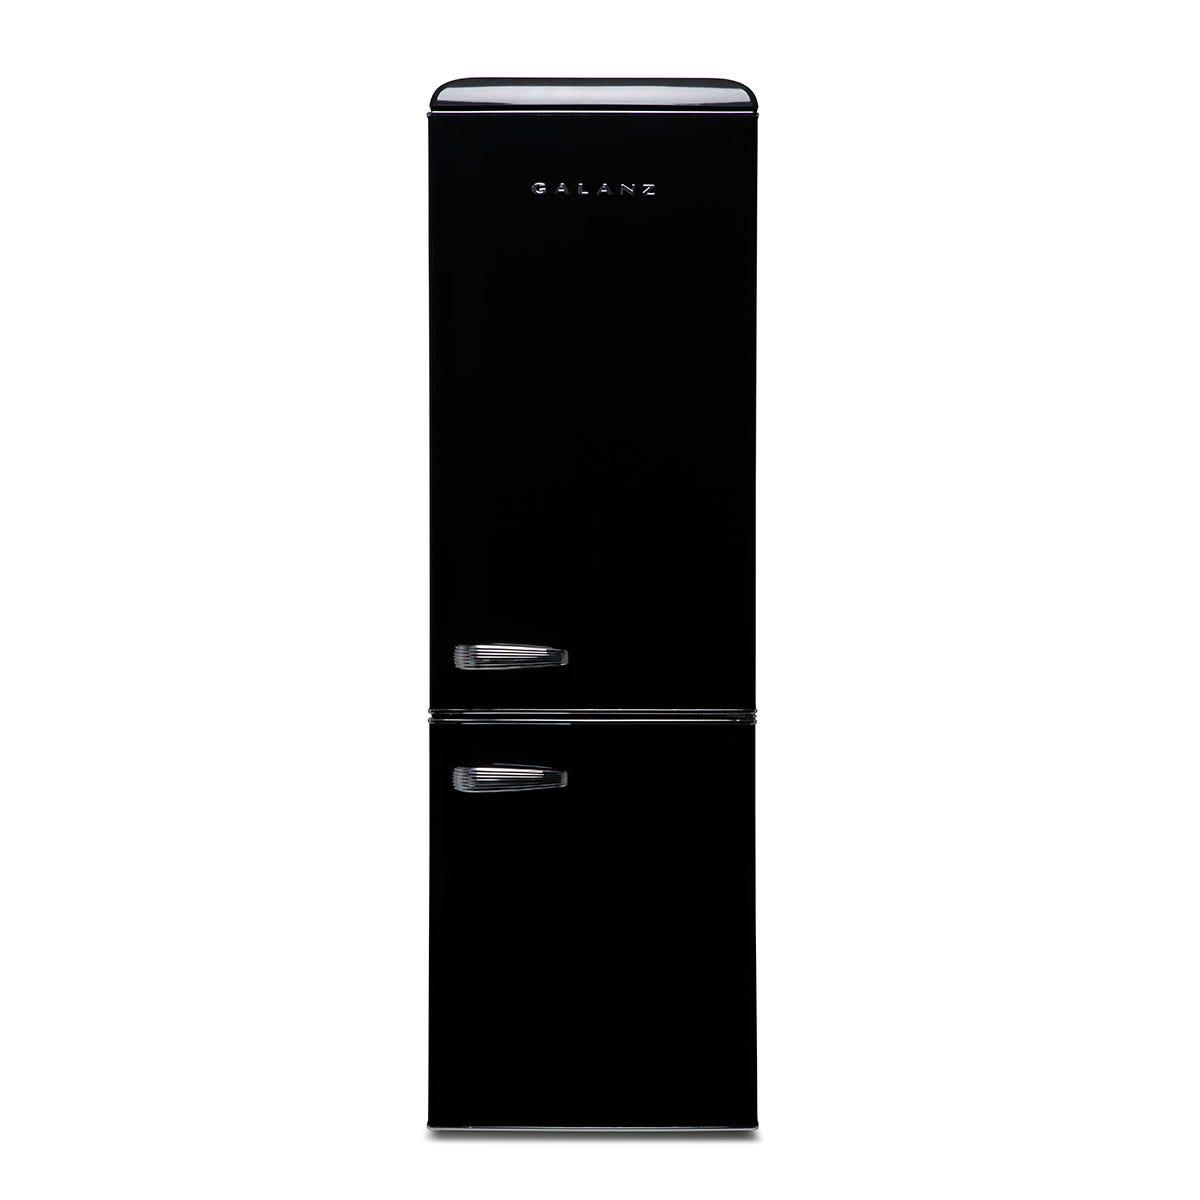 Galanz RFFK002B 300L Freestanding Retro Fridge Freezer - Black